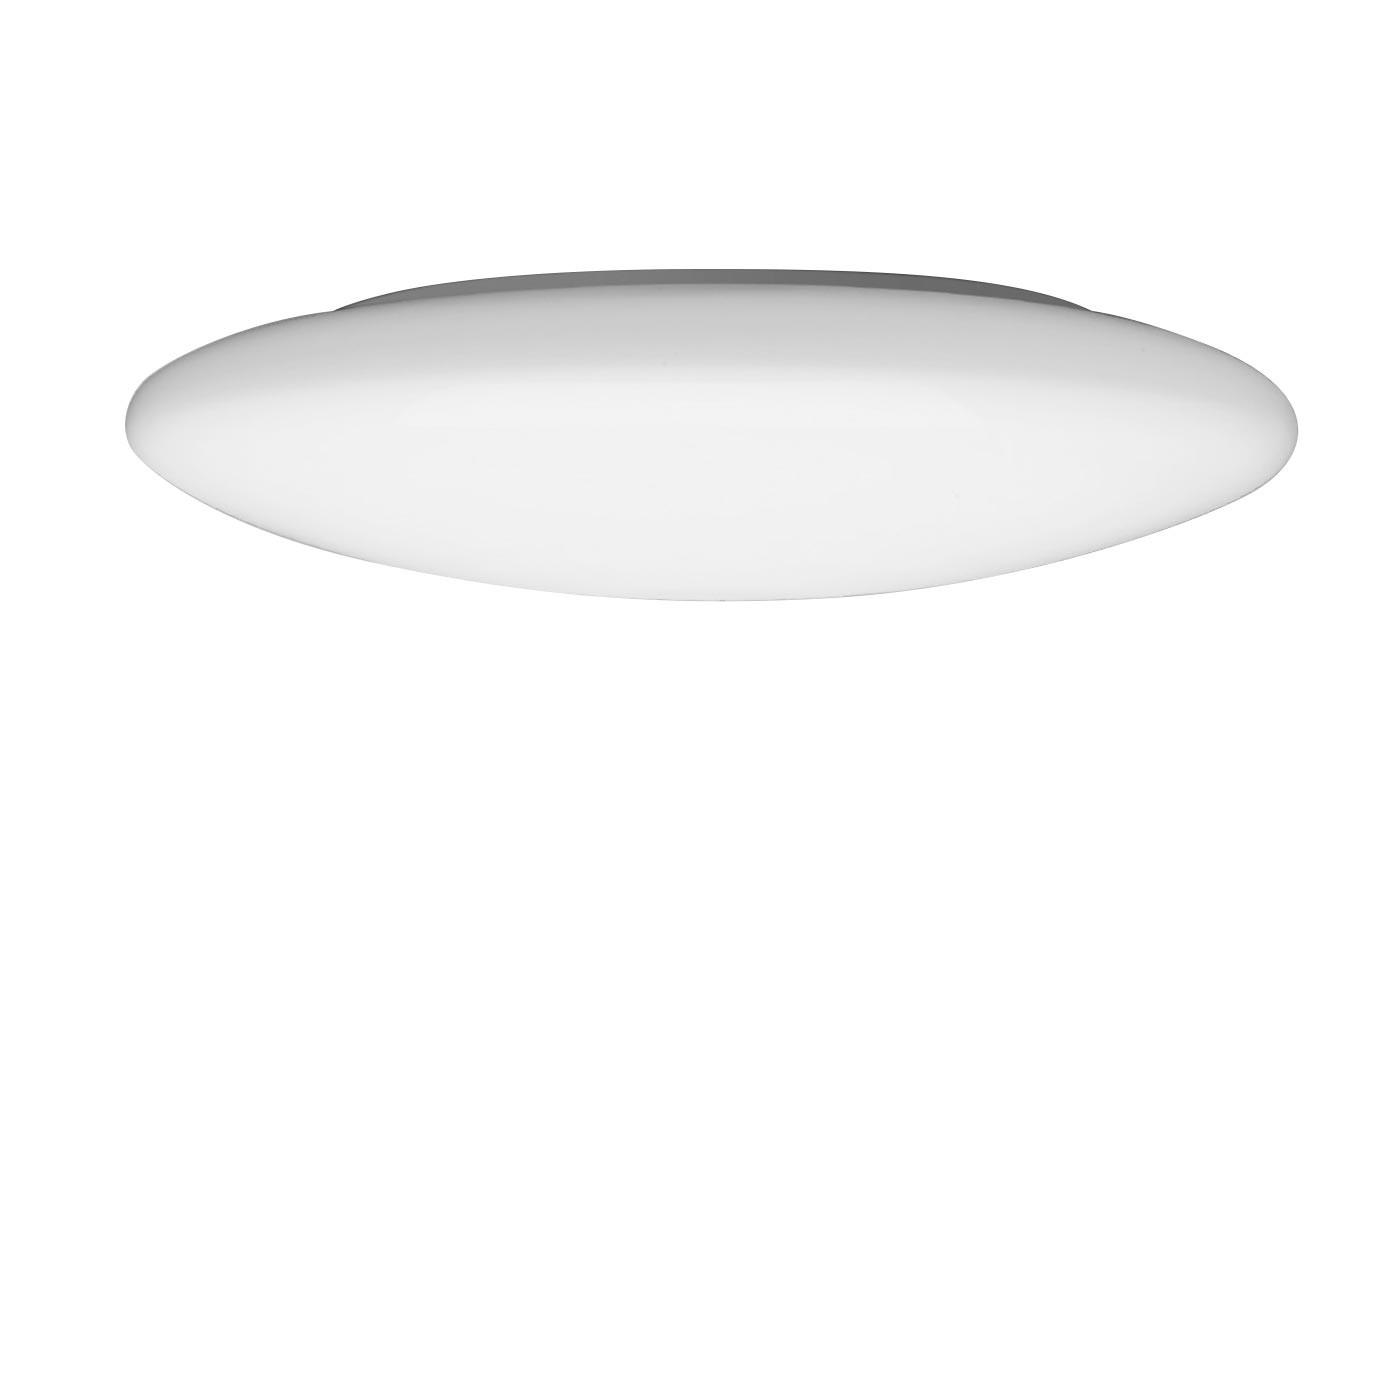 Bega 23296/23414/23299 LED Applique/Plafonnier